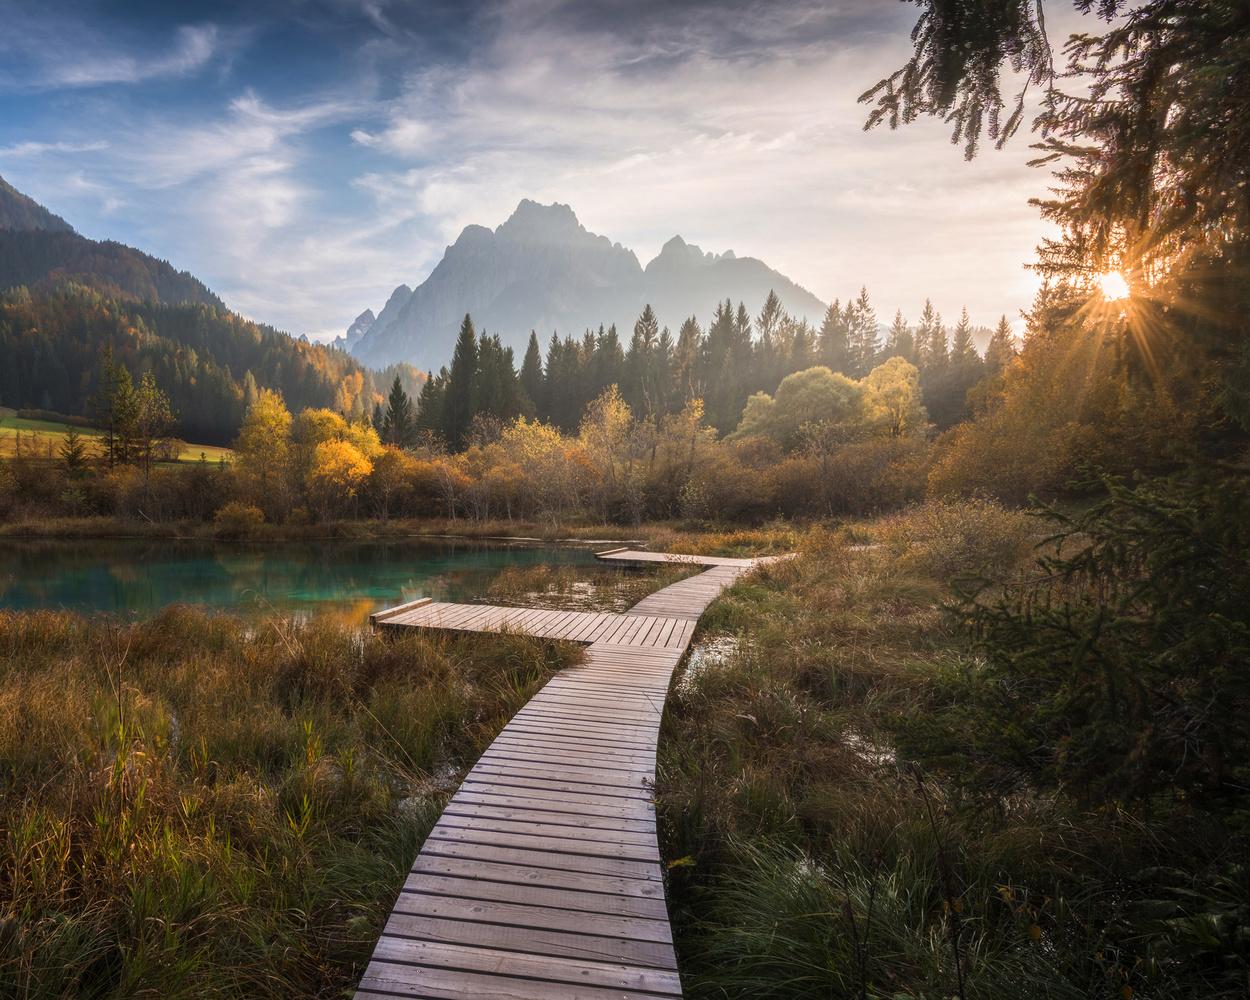 Lake Zelenci by Philip Slotte